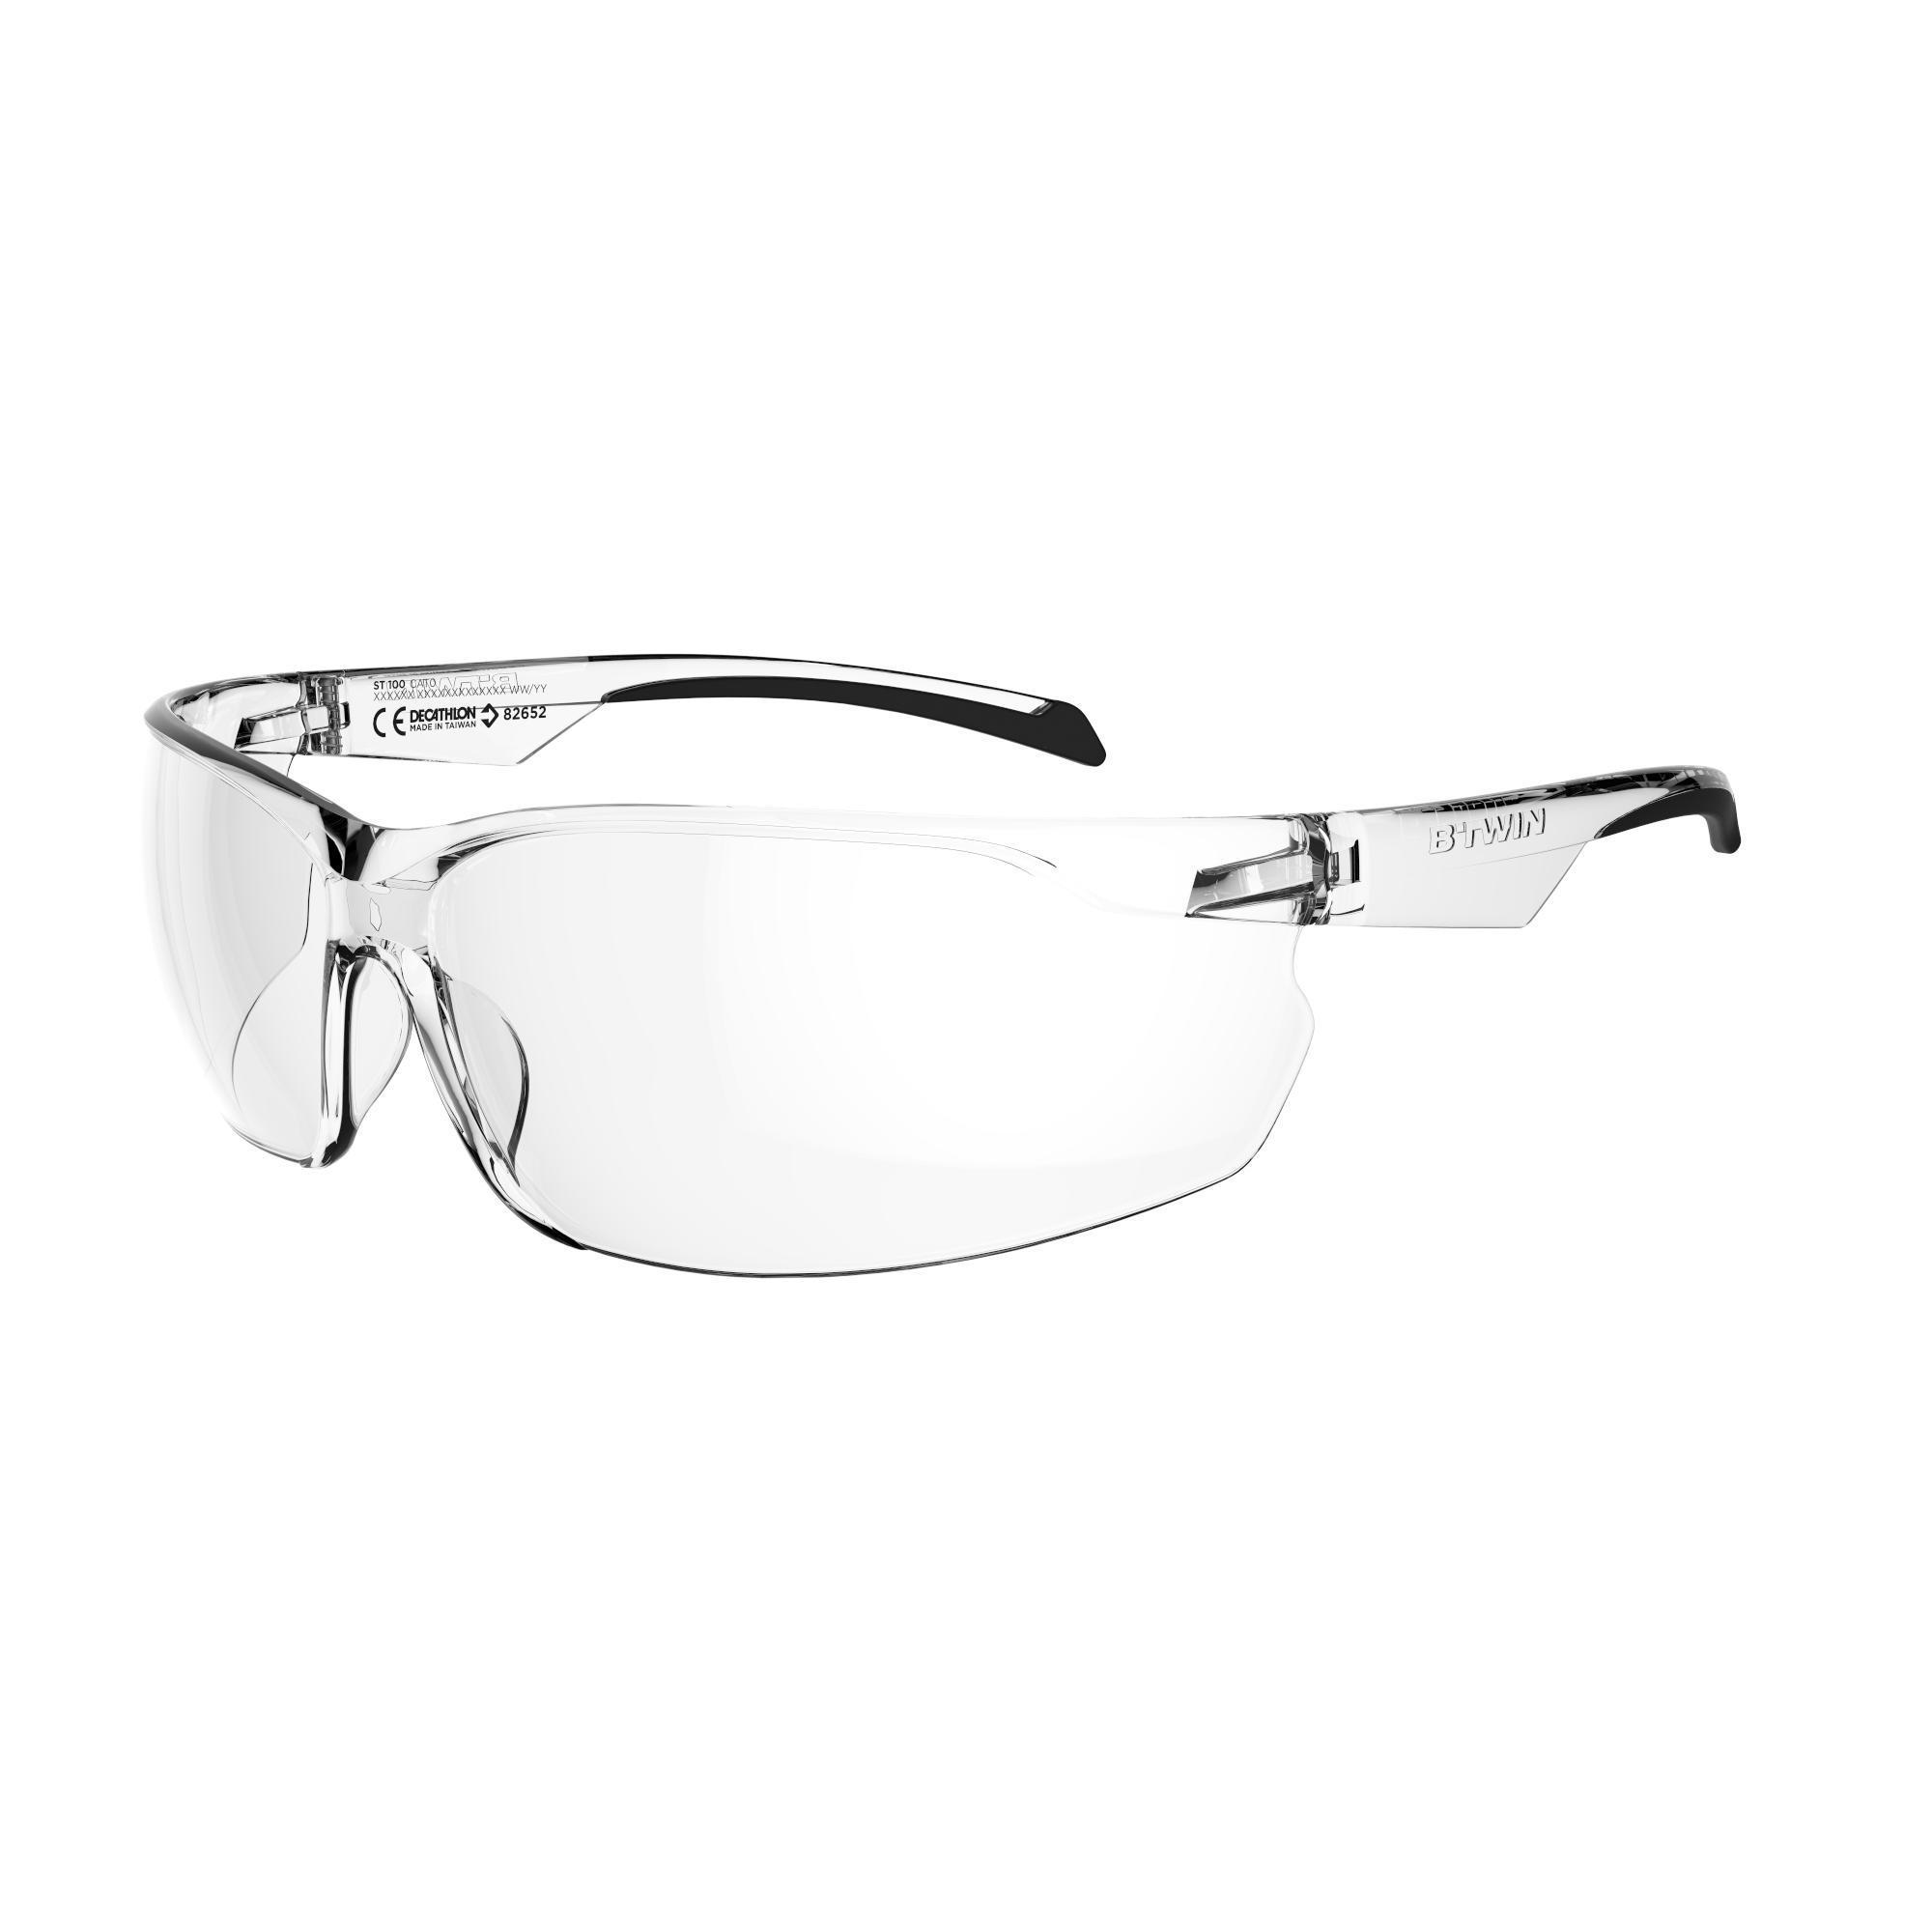 Rockrider Fietsbril voor volwassenen ST 100 transparant categorie 0